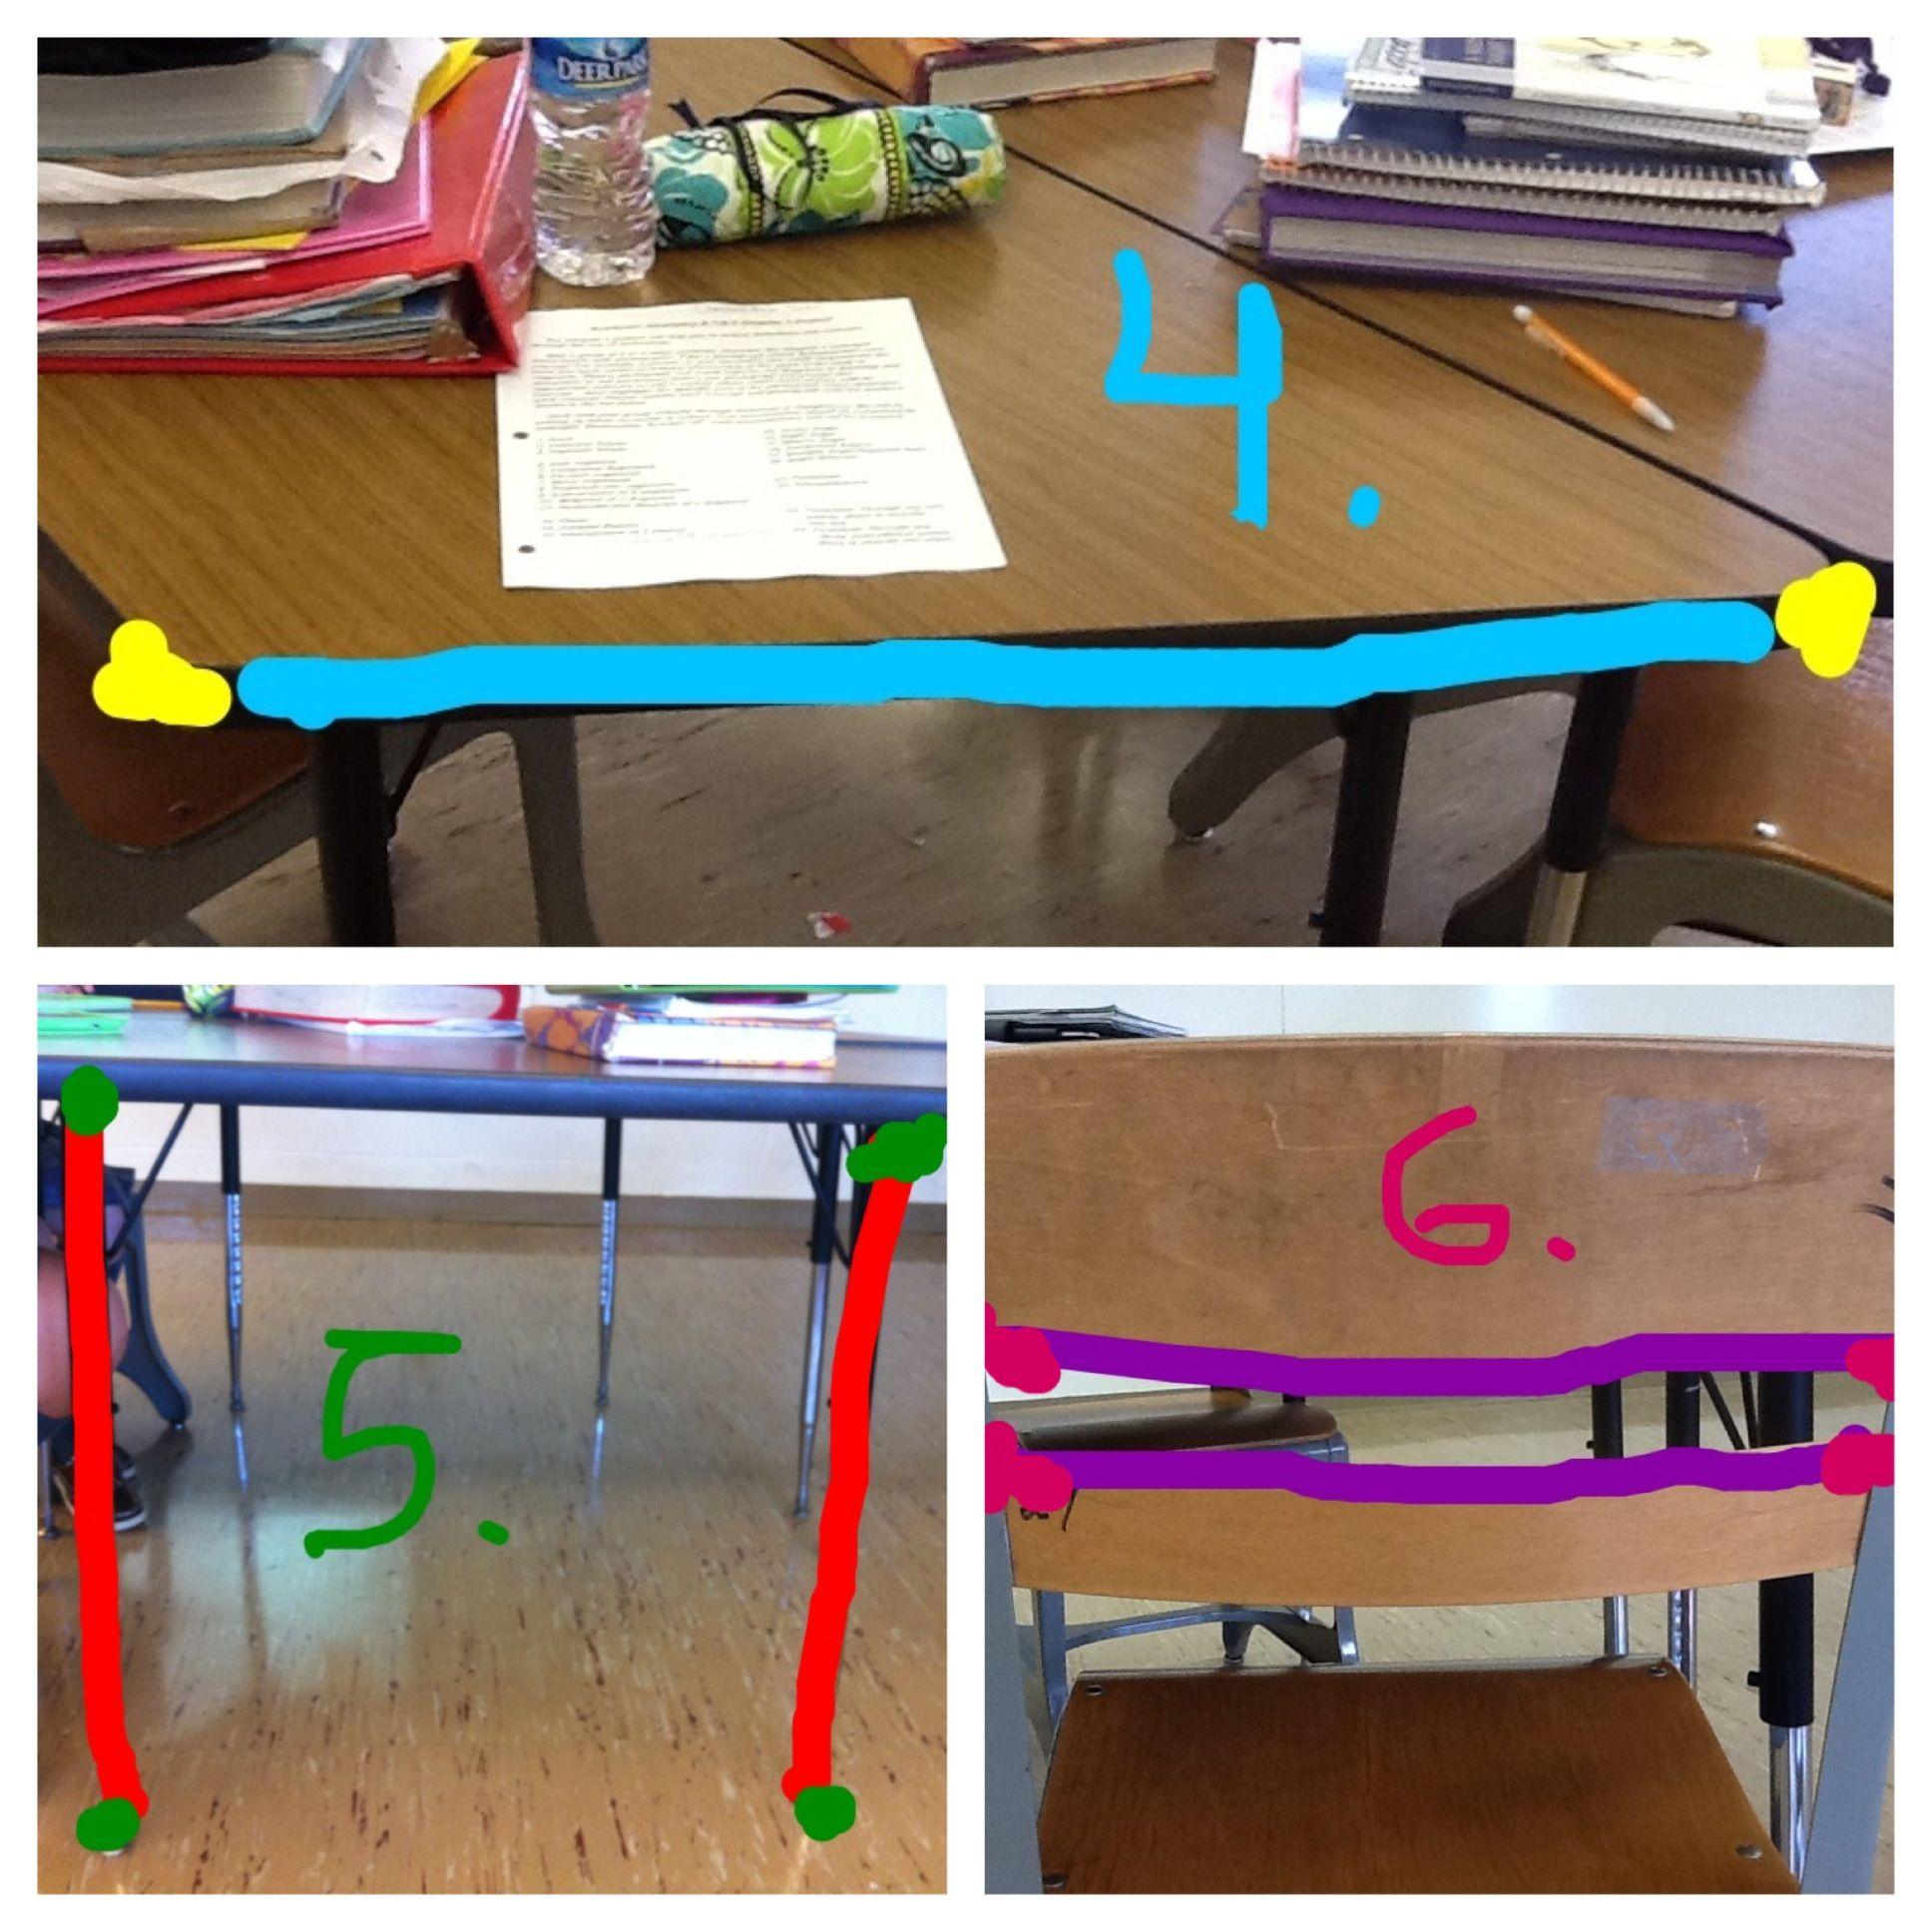 4 Line Segment 5 Congruent Segments 6 Parallel Segments